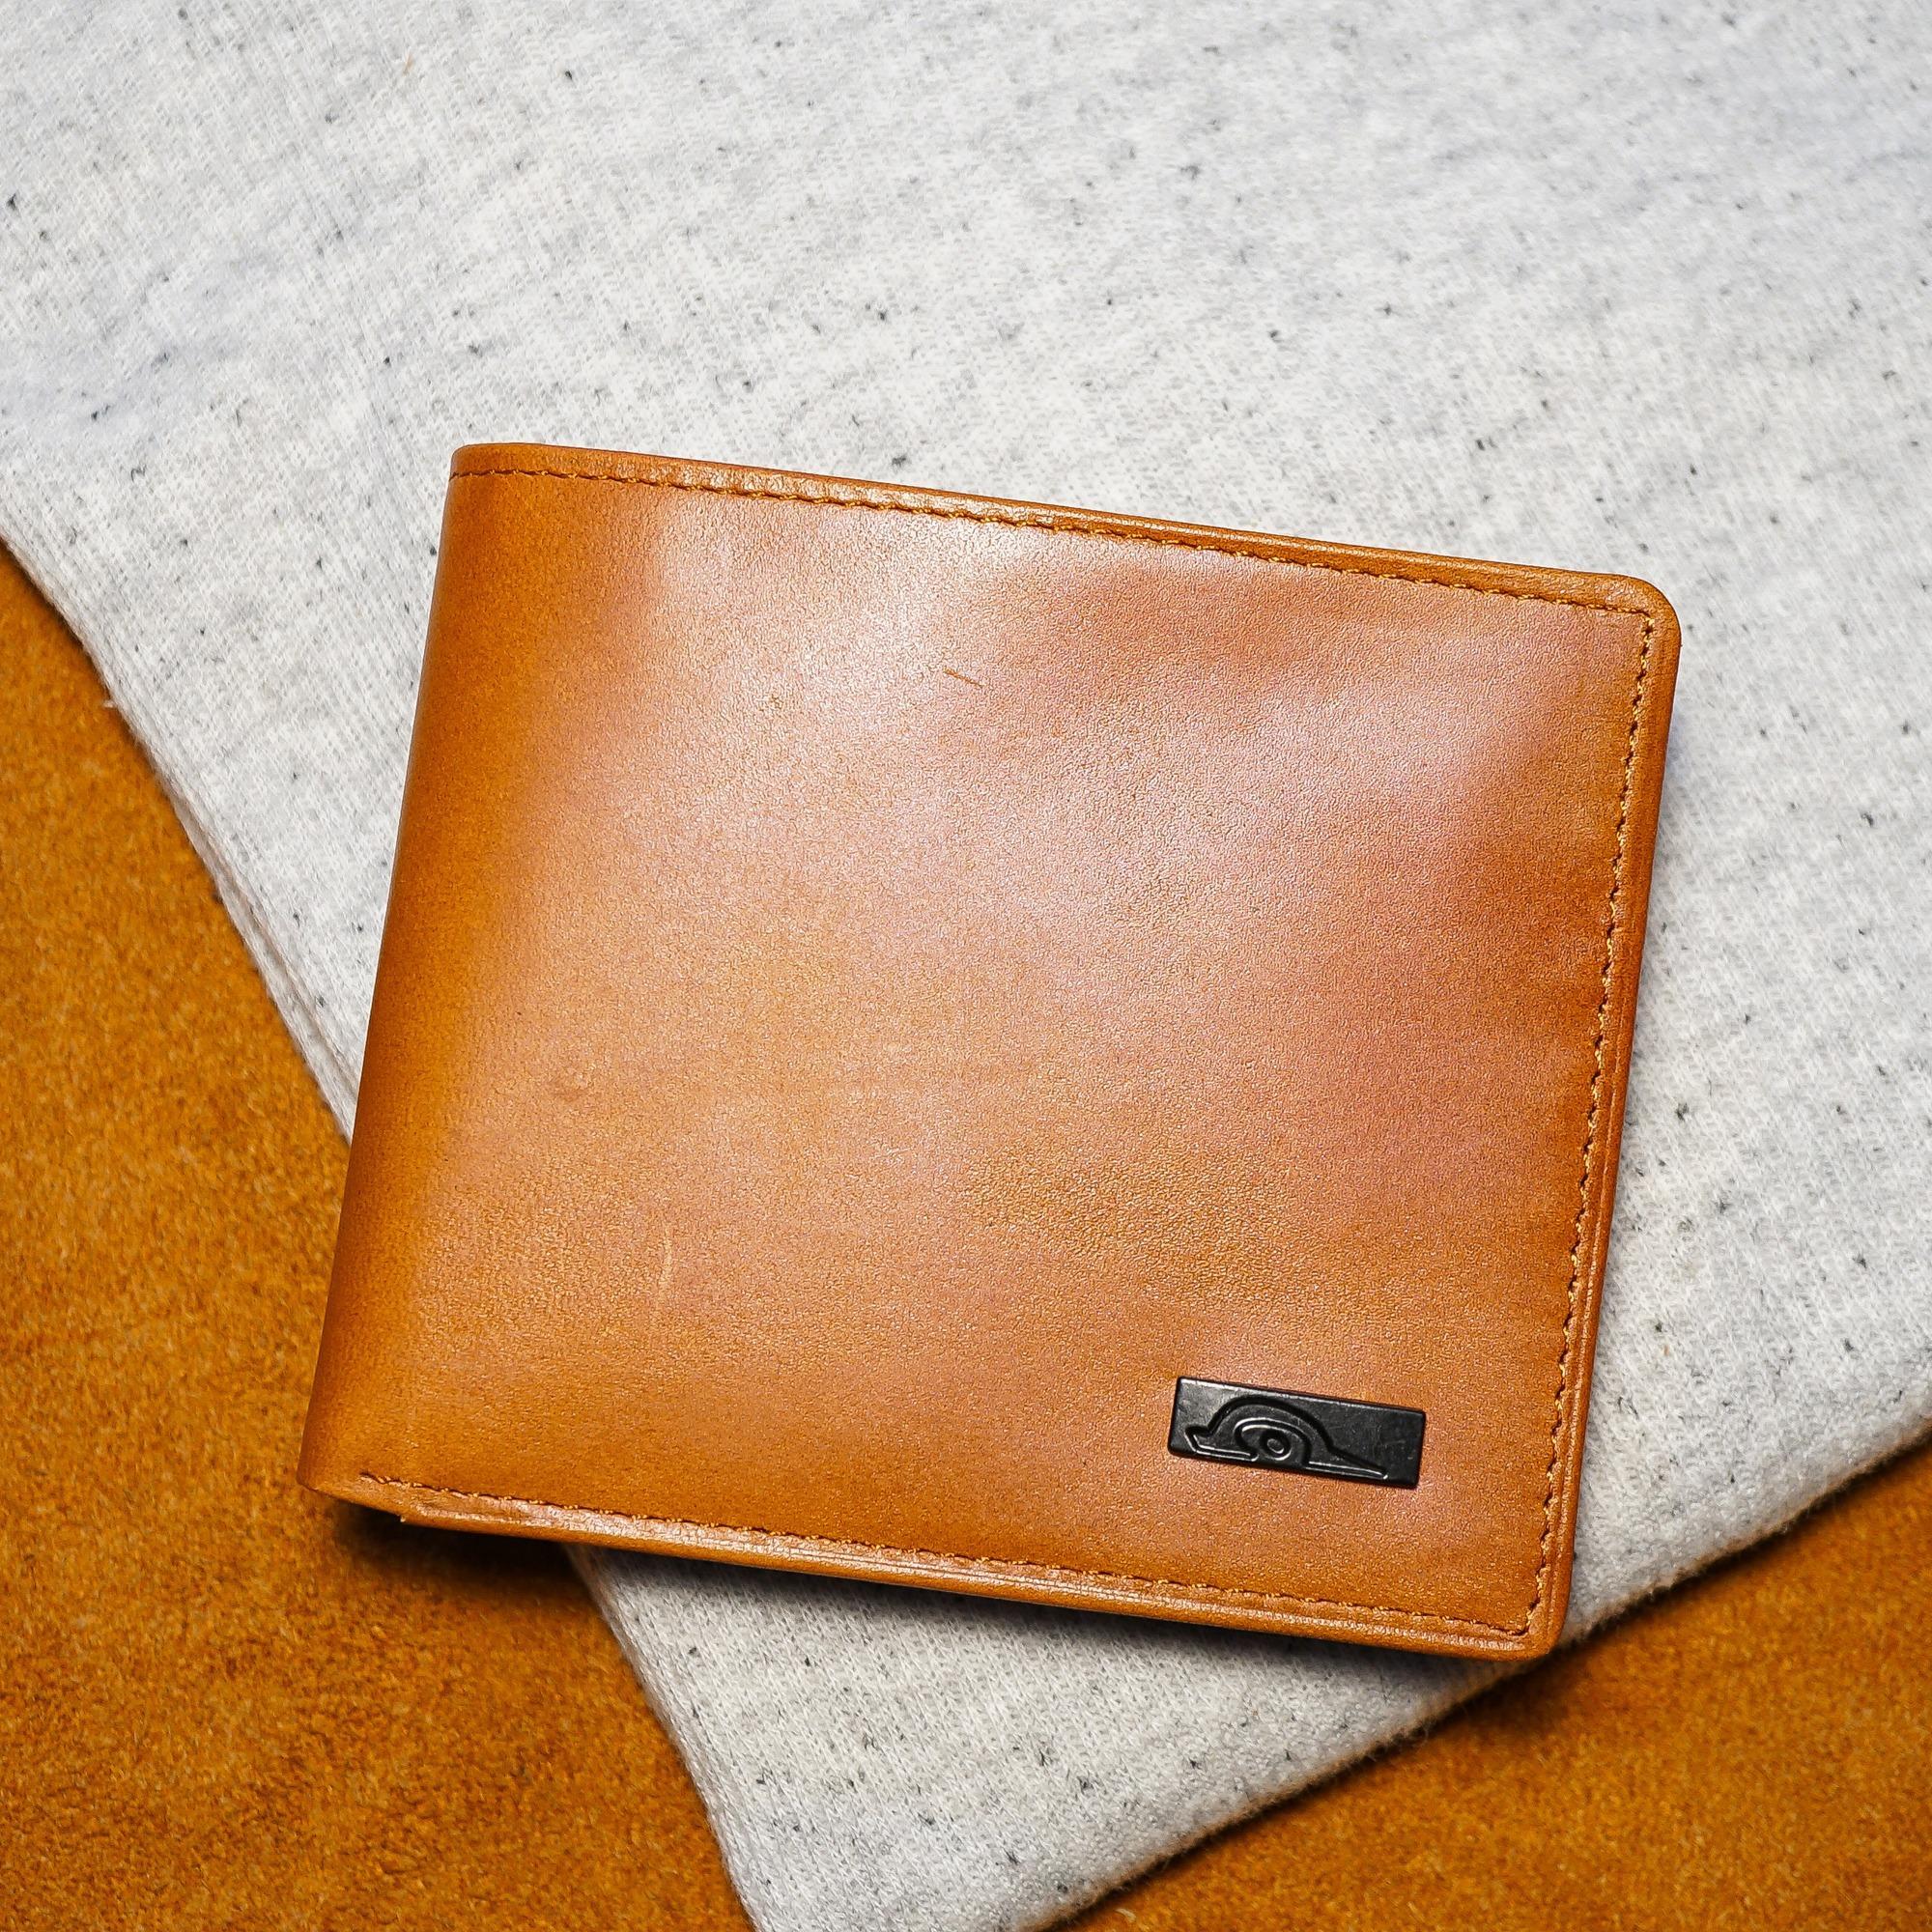 Toko Jfr Fashion Dompet Pria Kulit Asli Jf06 Coklat Jfr Online